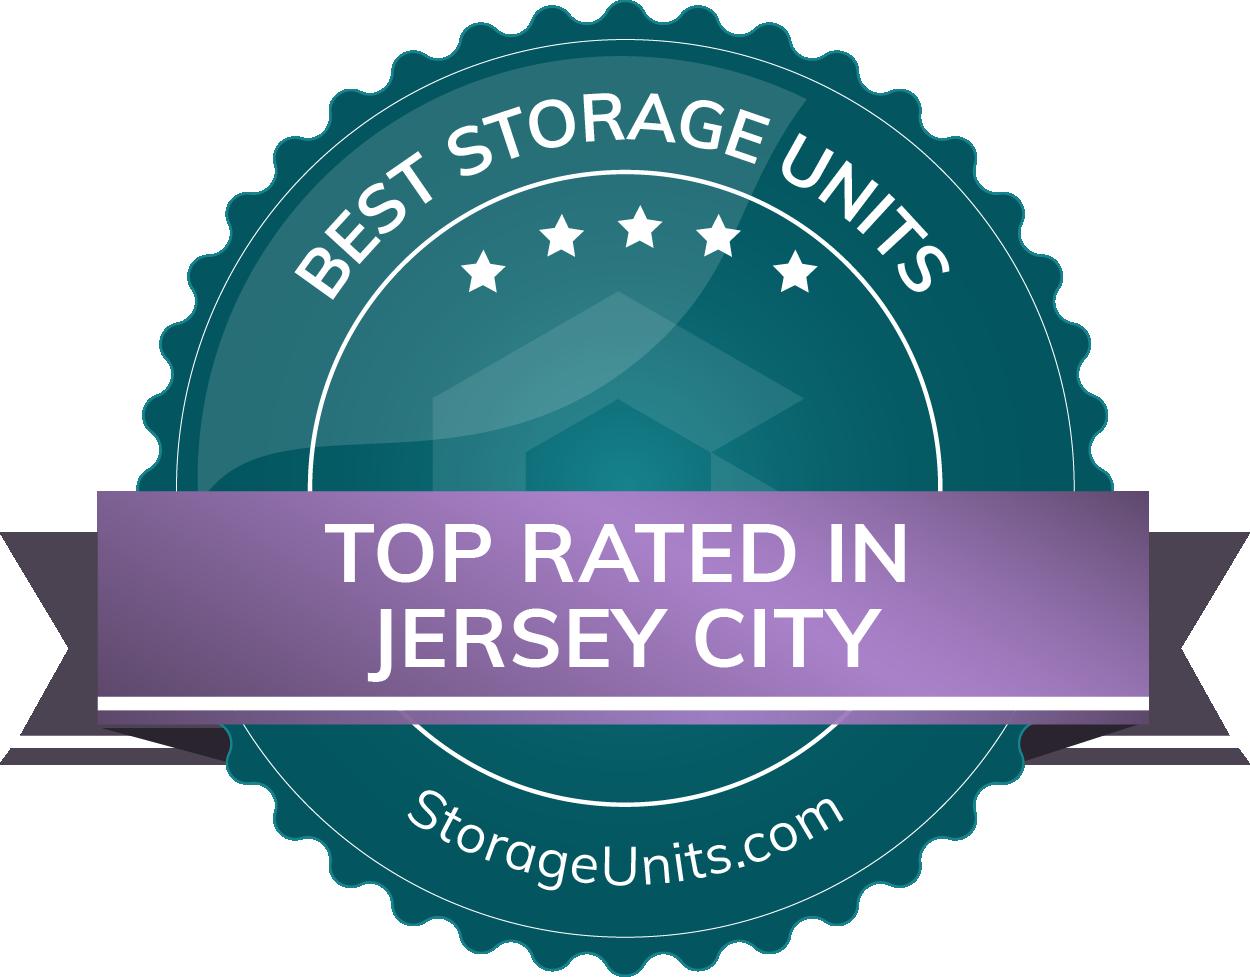 Best Self Storage Units in Jersey City, NJ